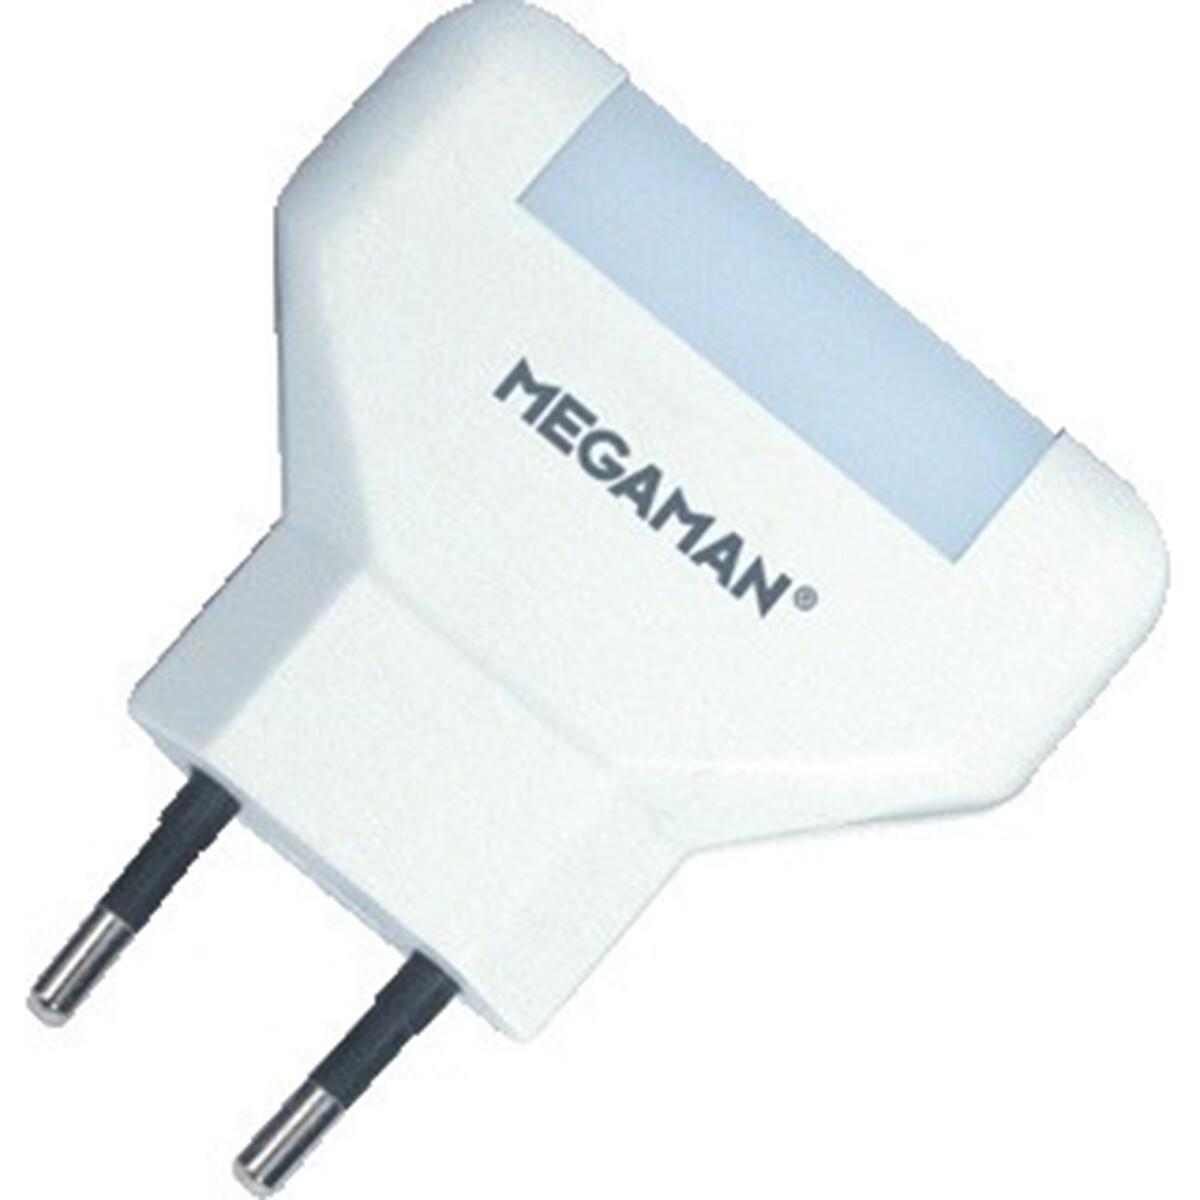 MEGAMAN - Stekkerlamp Lamp - Hatso - 0.2W - Warm Wit 2700K - Rond - Mat Wit